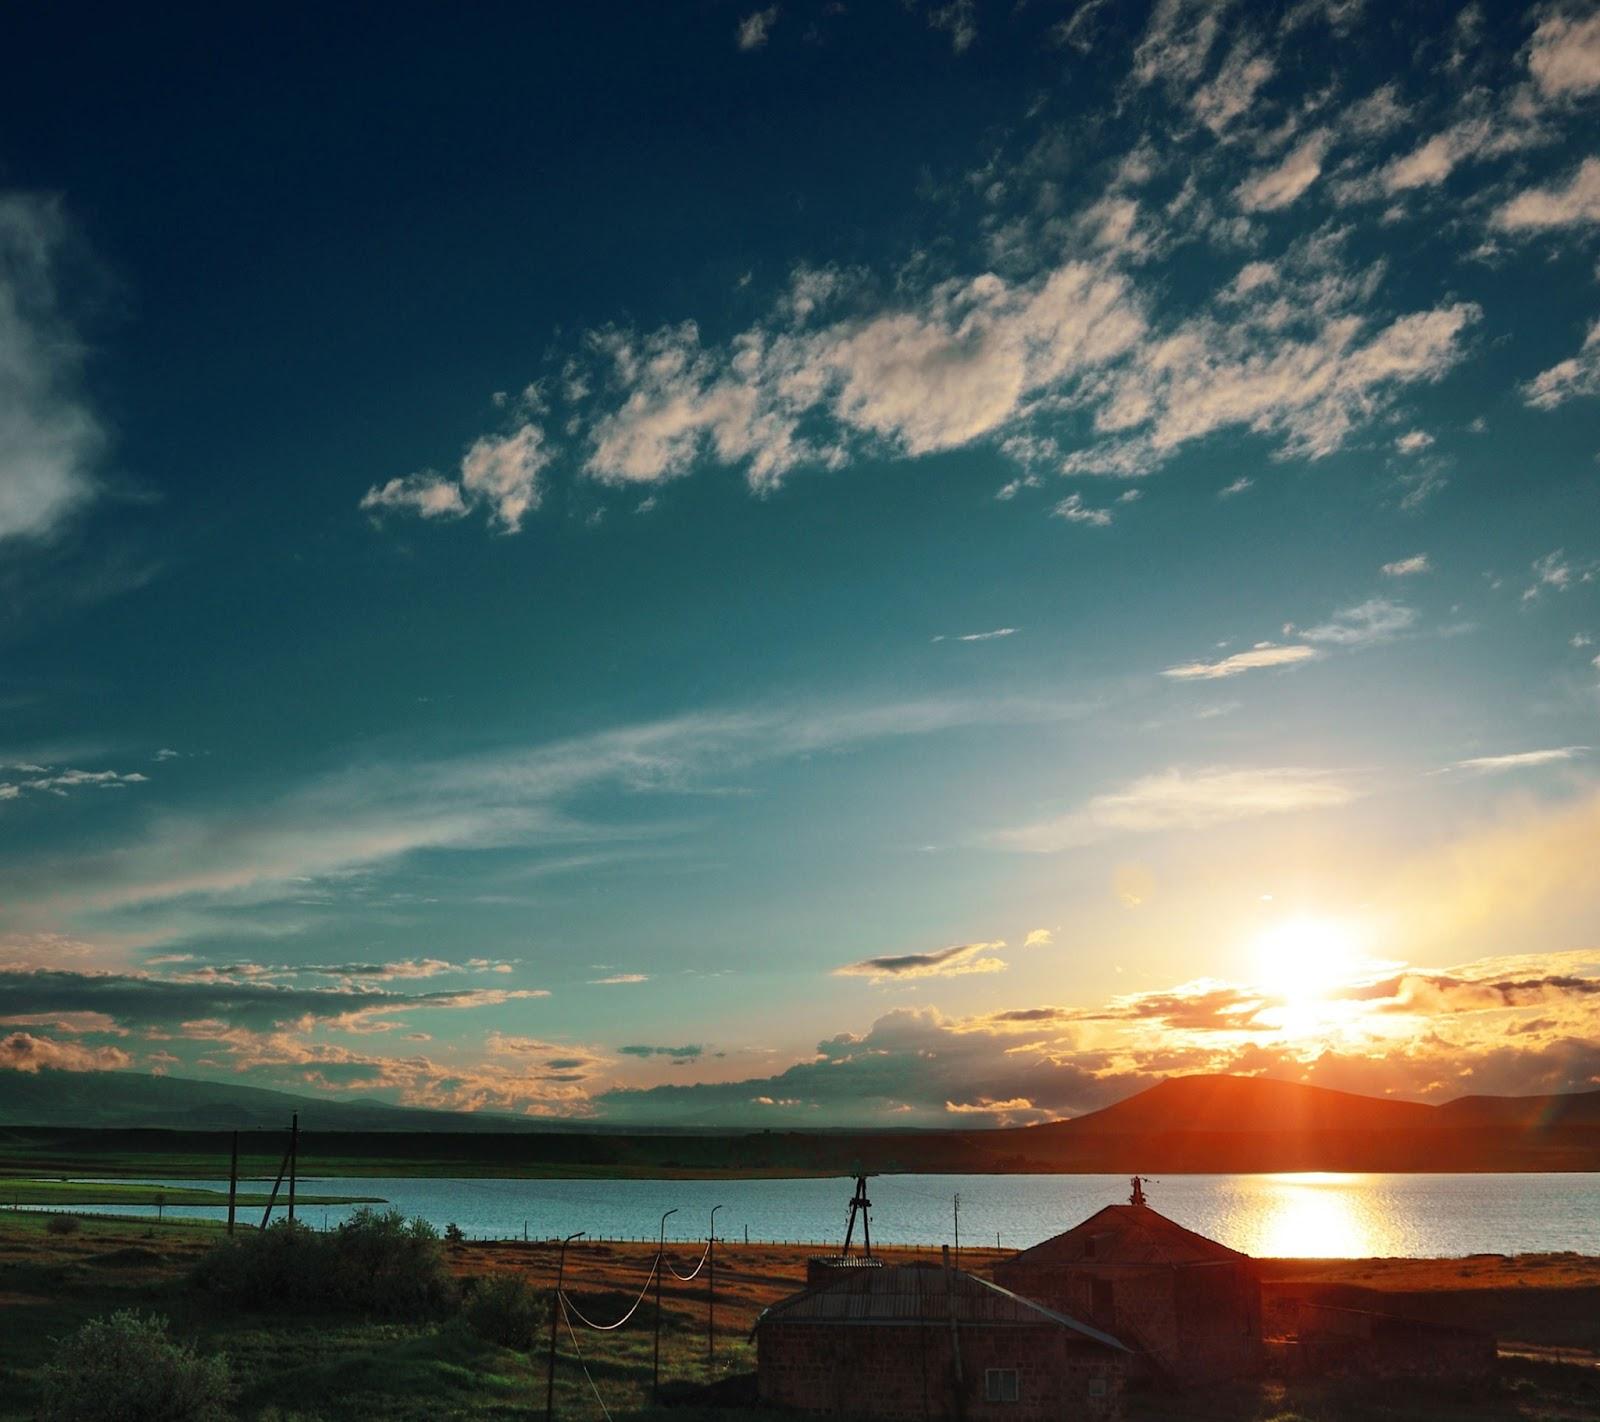 http://1.bp.blogspot.com/-KxcOlMA2_uc/UWmtX84CHhI/AAAAAAAAYIM/EXSf4Pejq74/s1600/armenia-sunset-samsung-galaxy-s4-wallpaper.jpg